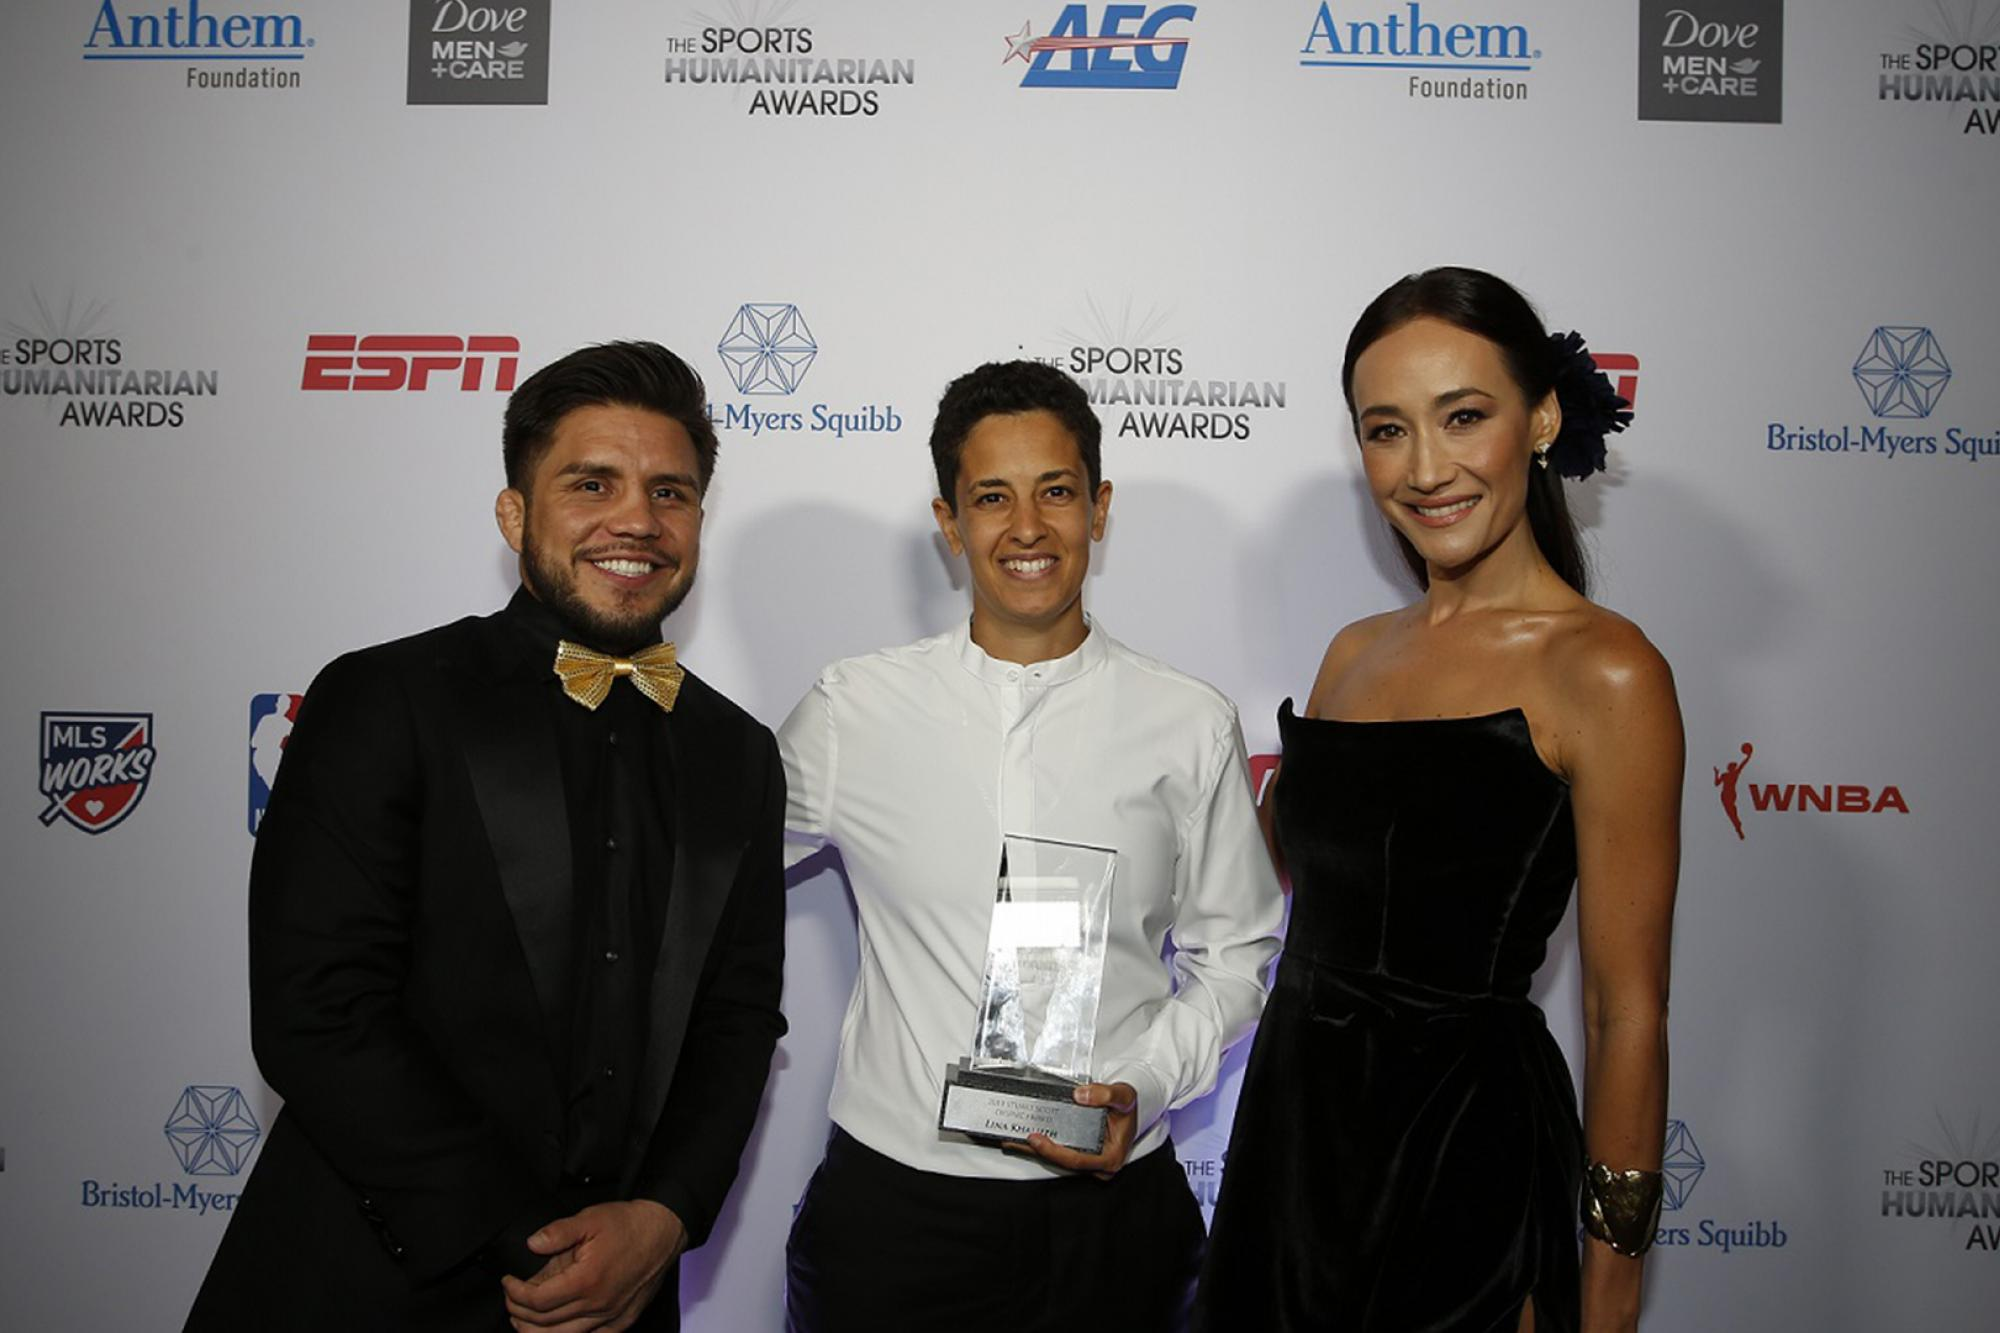 UFC Presents Stuart Scott ENSPIRE Award At Sports Humanitarian Awards